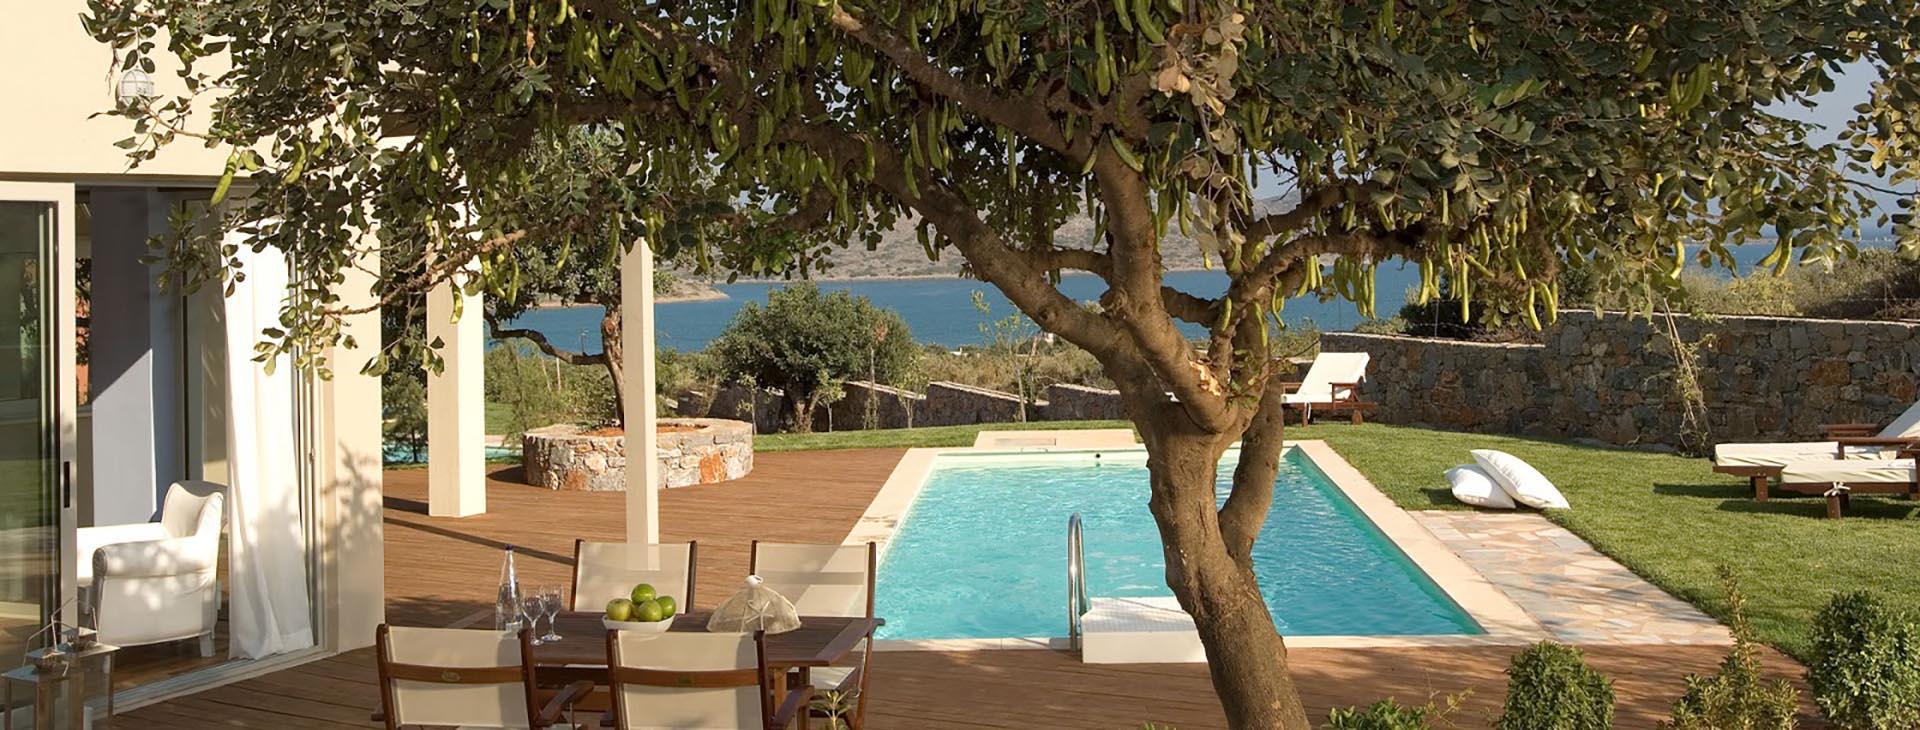 Elounda Carob Tree Valley Villas